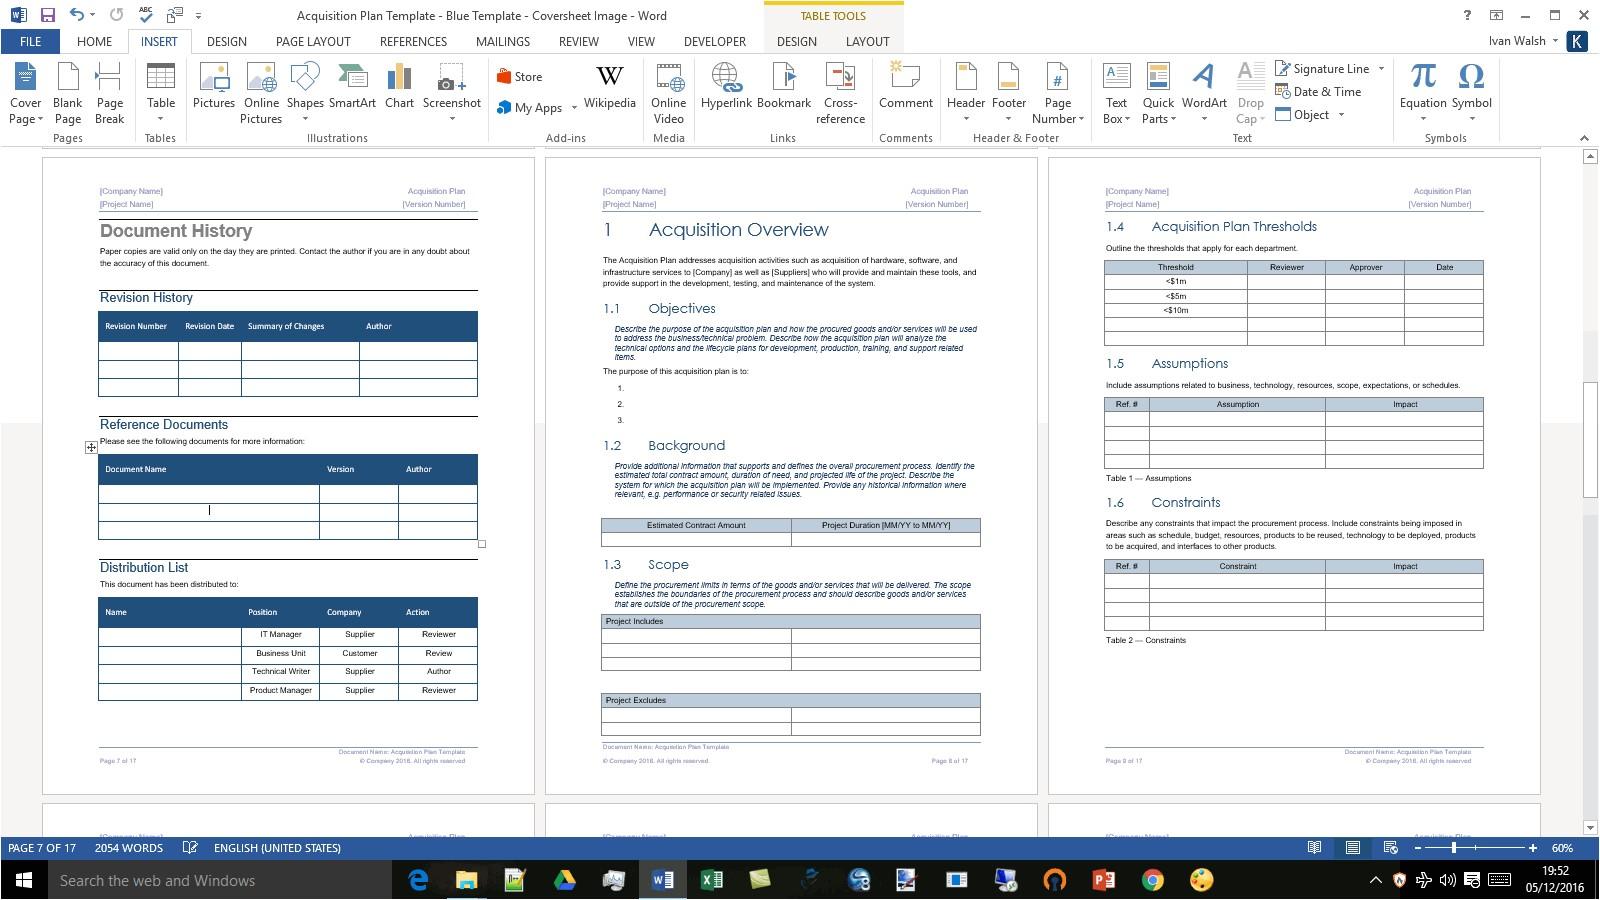 acquisition plan template